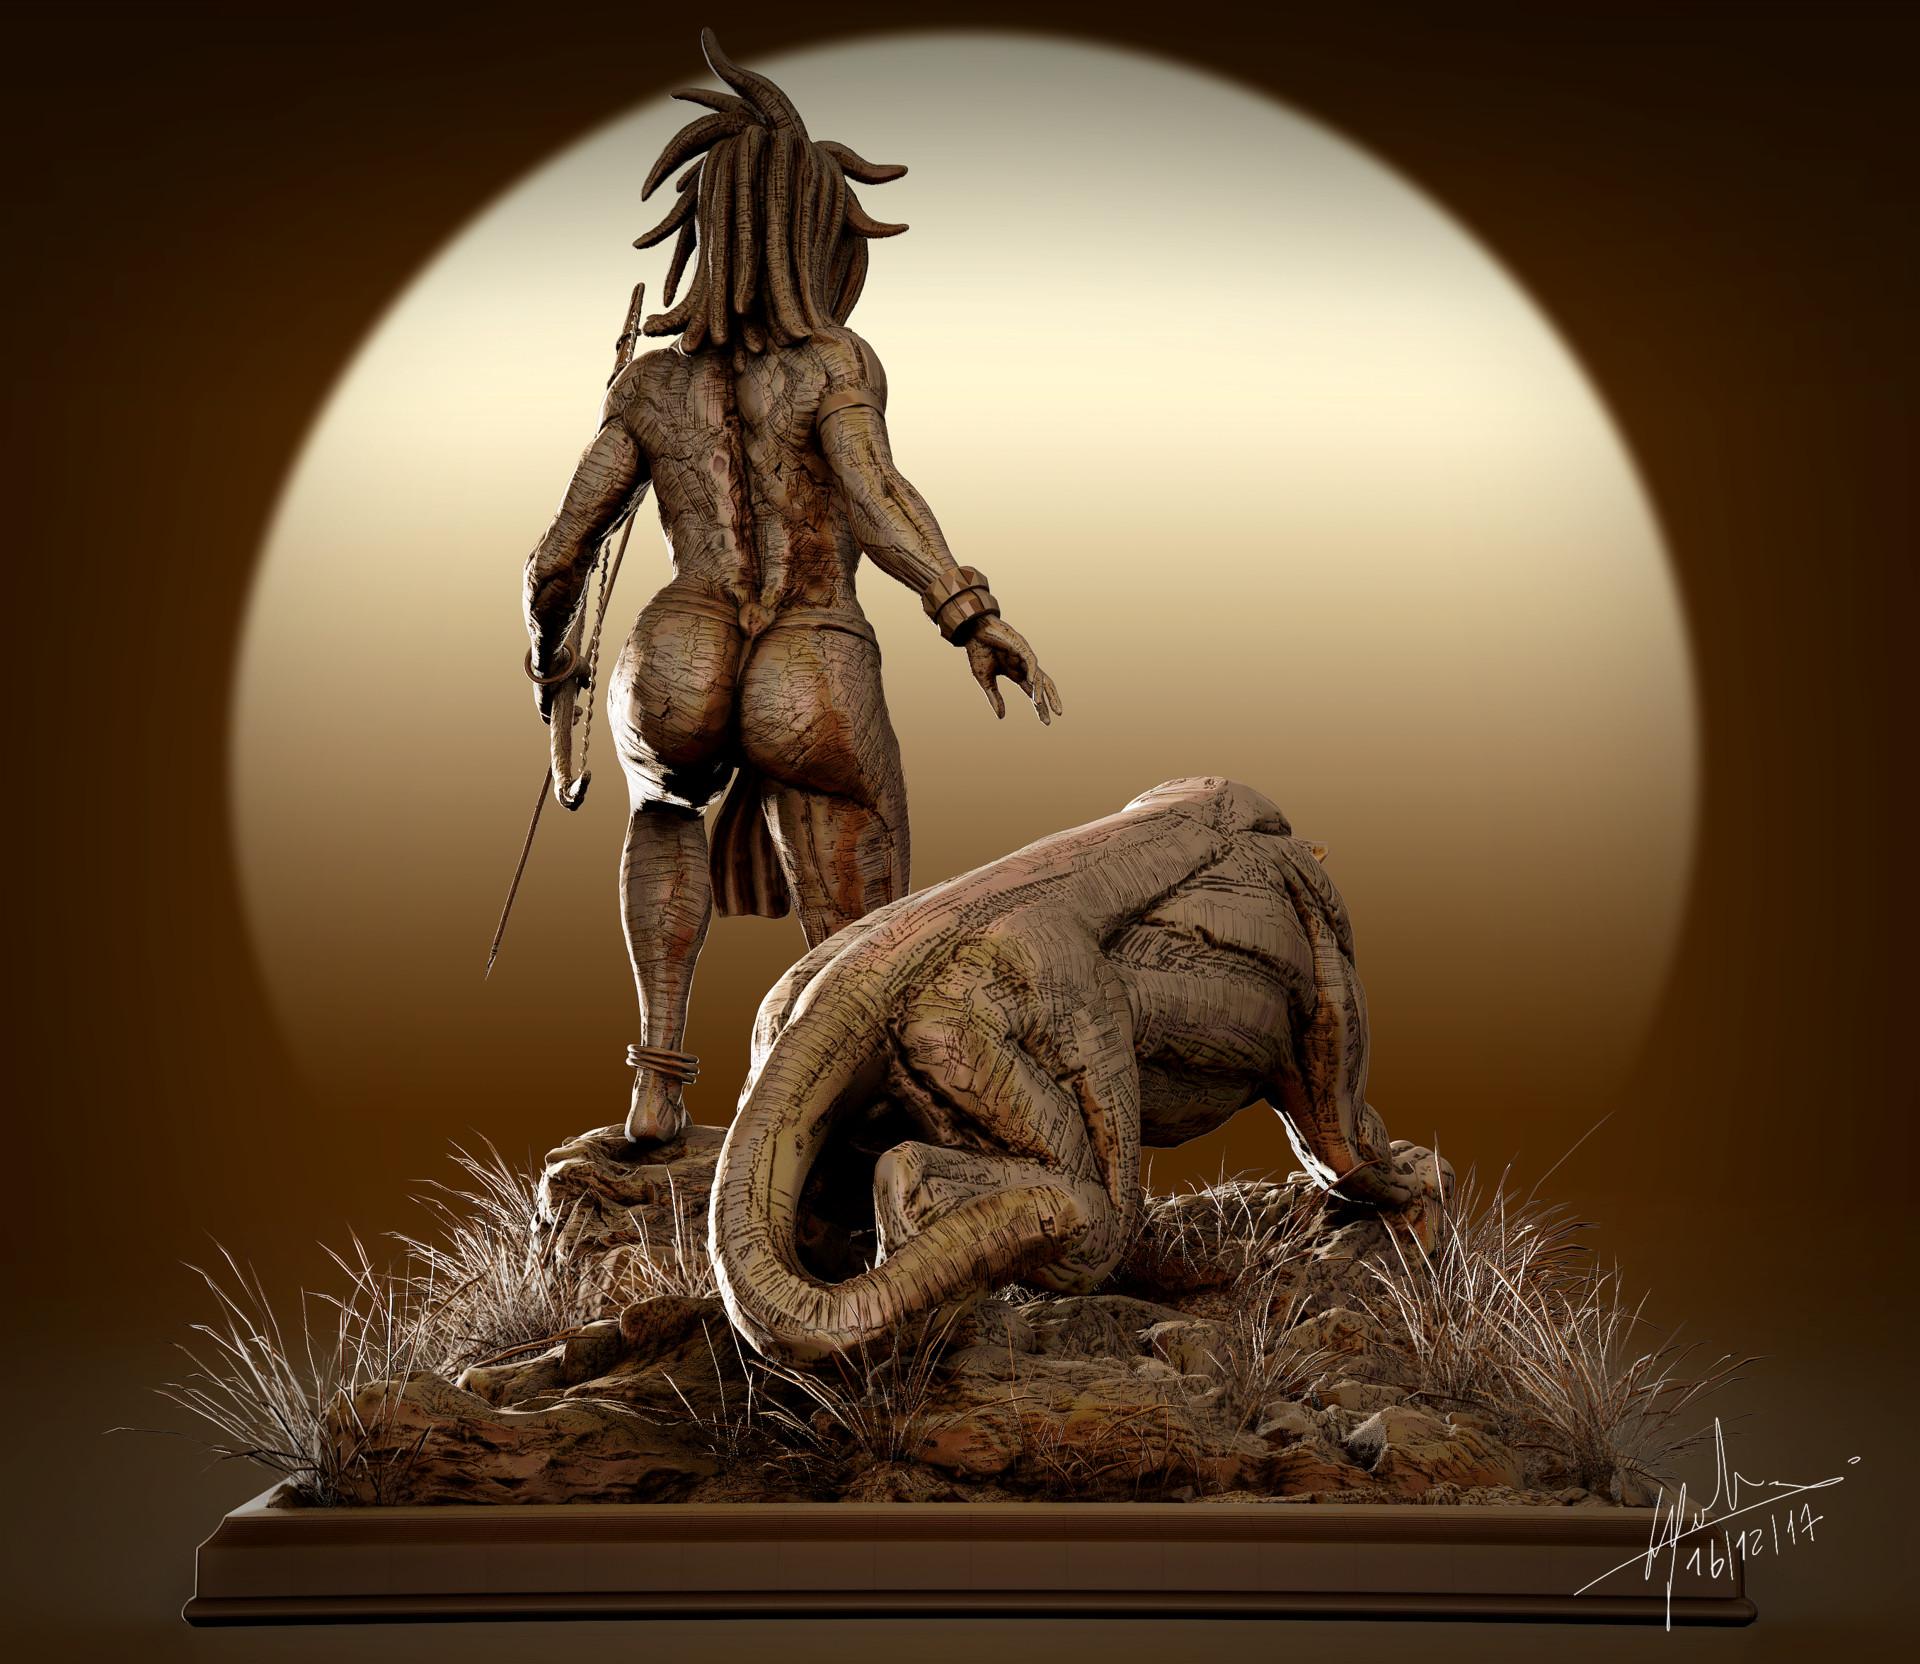 Fabien cazenabe black panter sculpt anatomy art cazenabe fabien 02